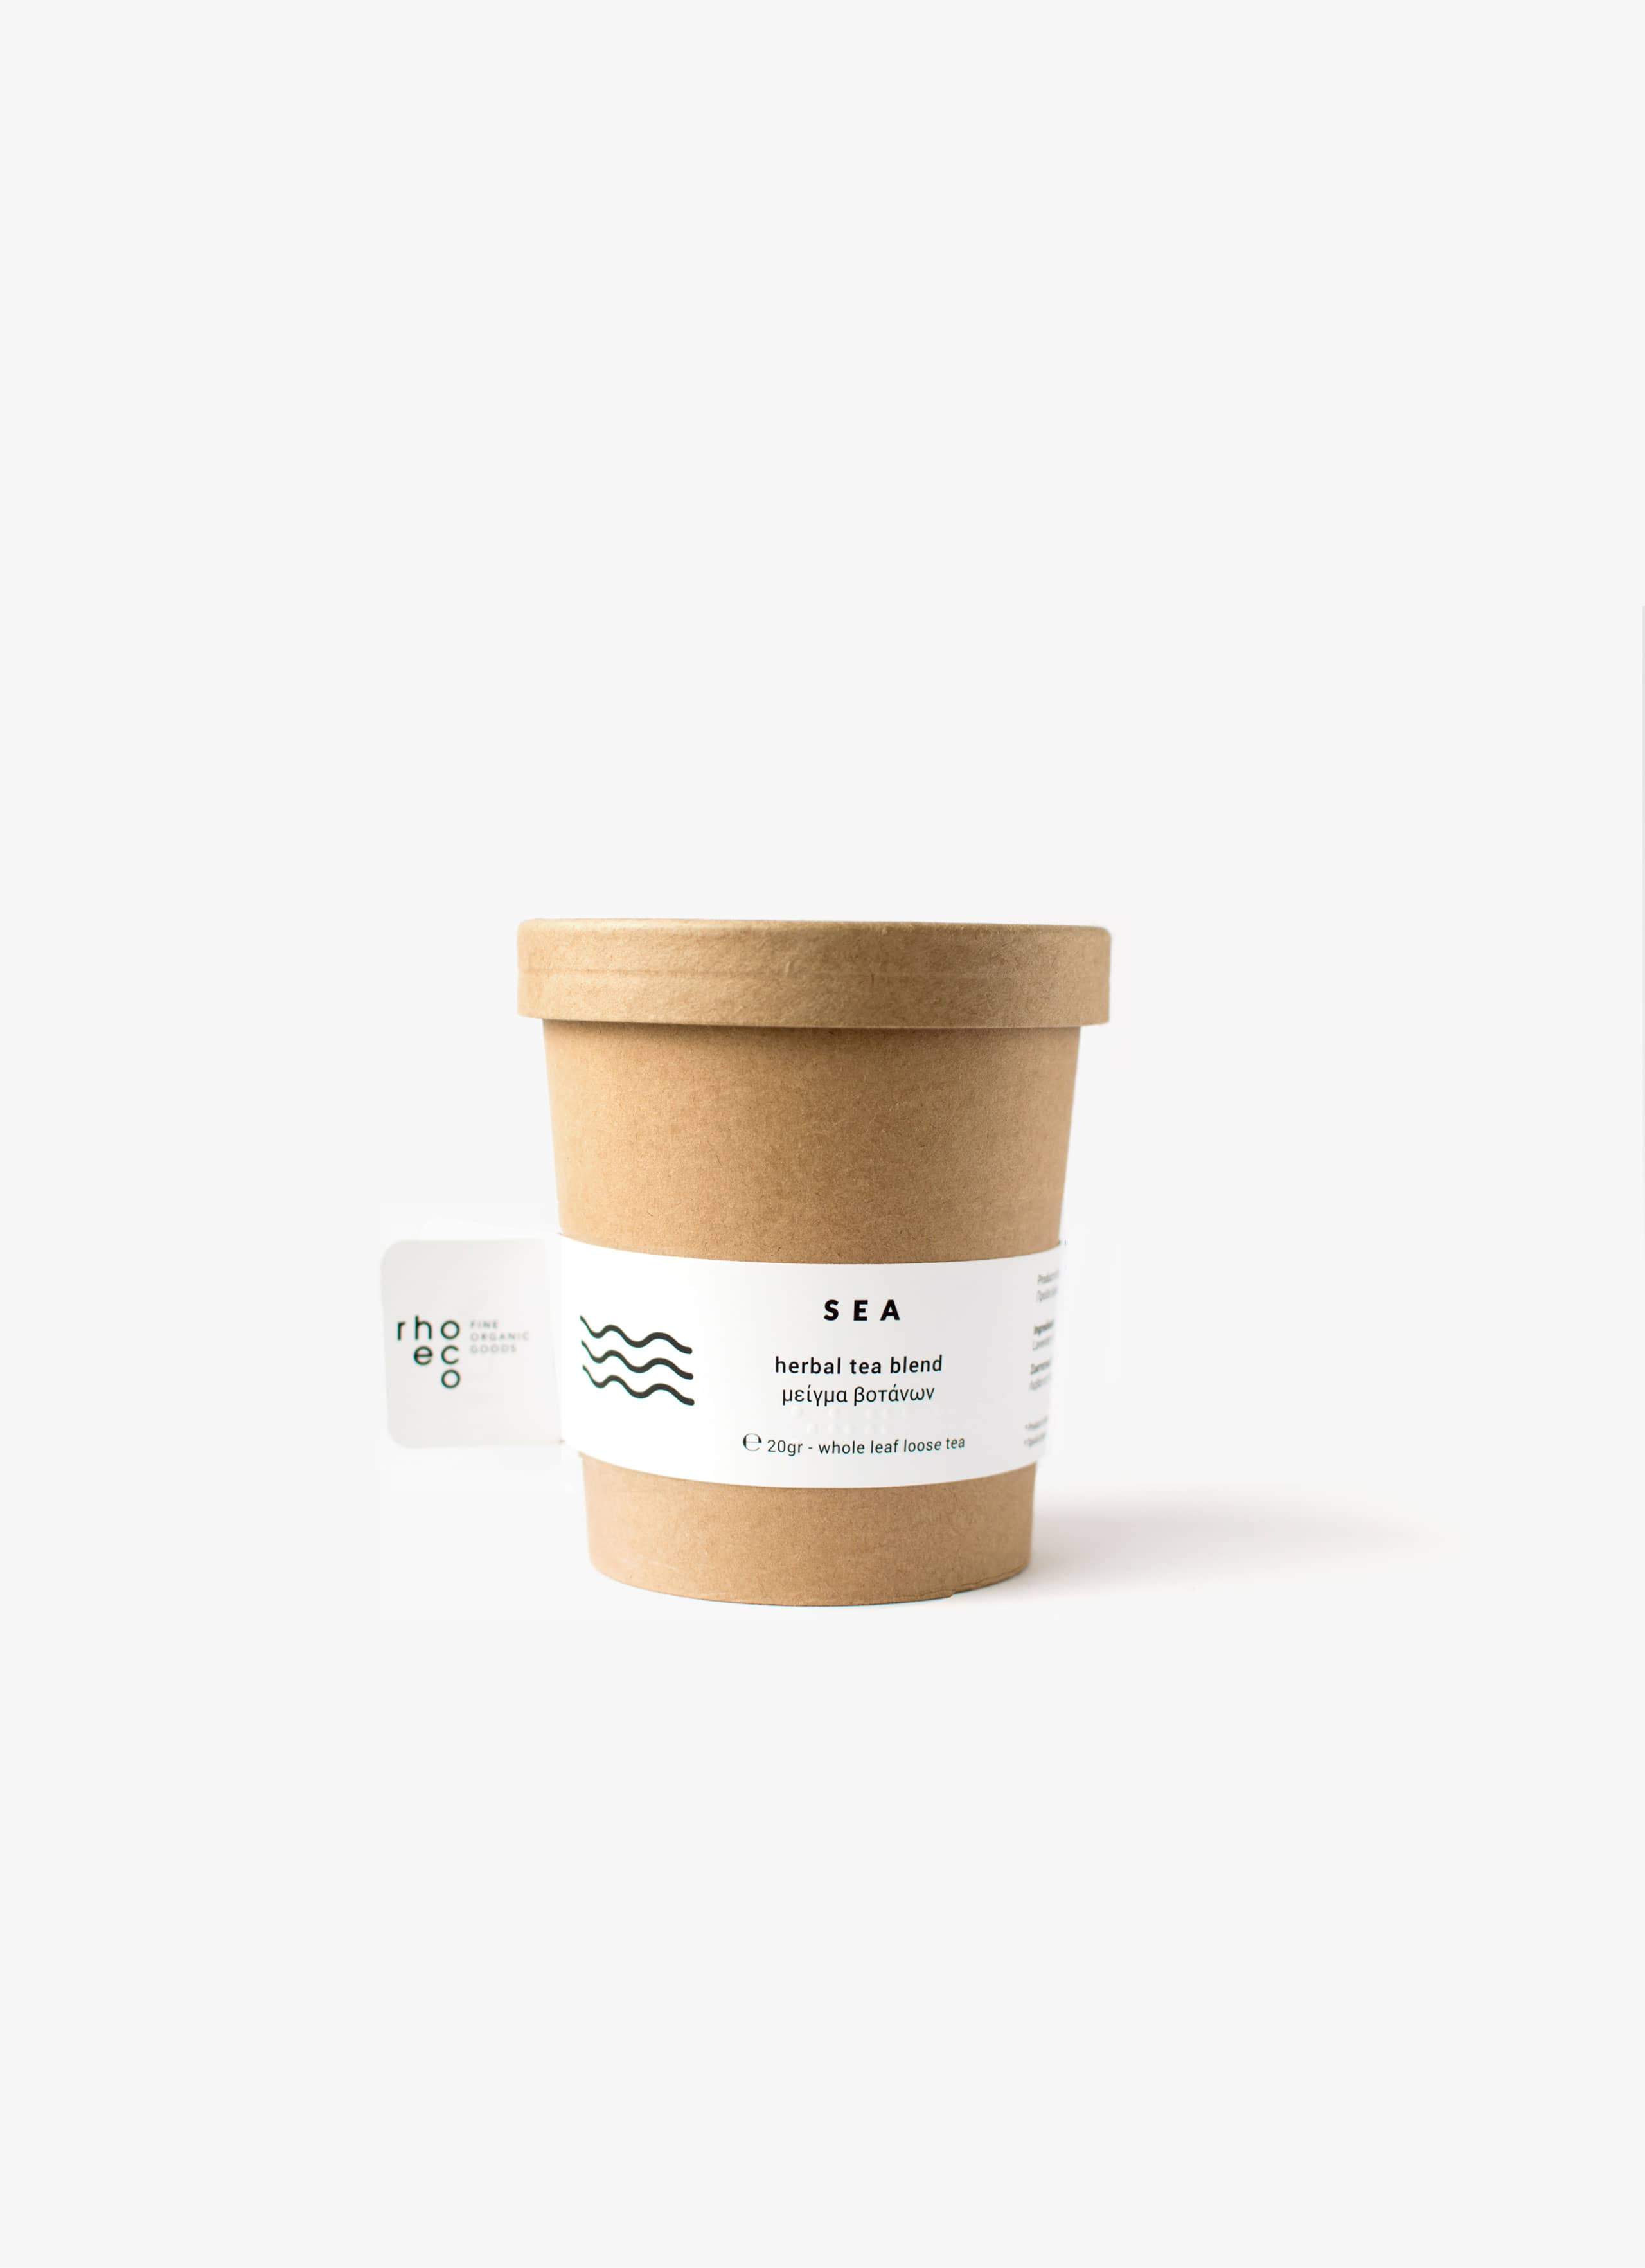 Rhoeco - Organic Tea - Drink it - Plant it - Sea